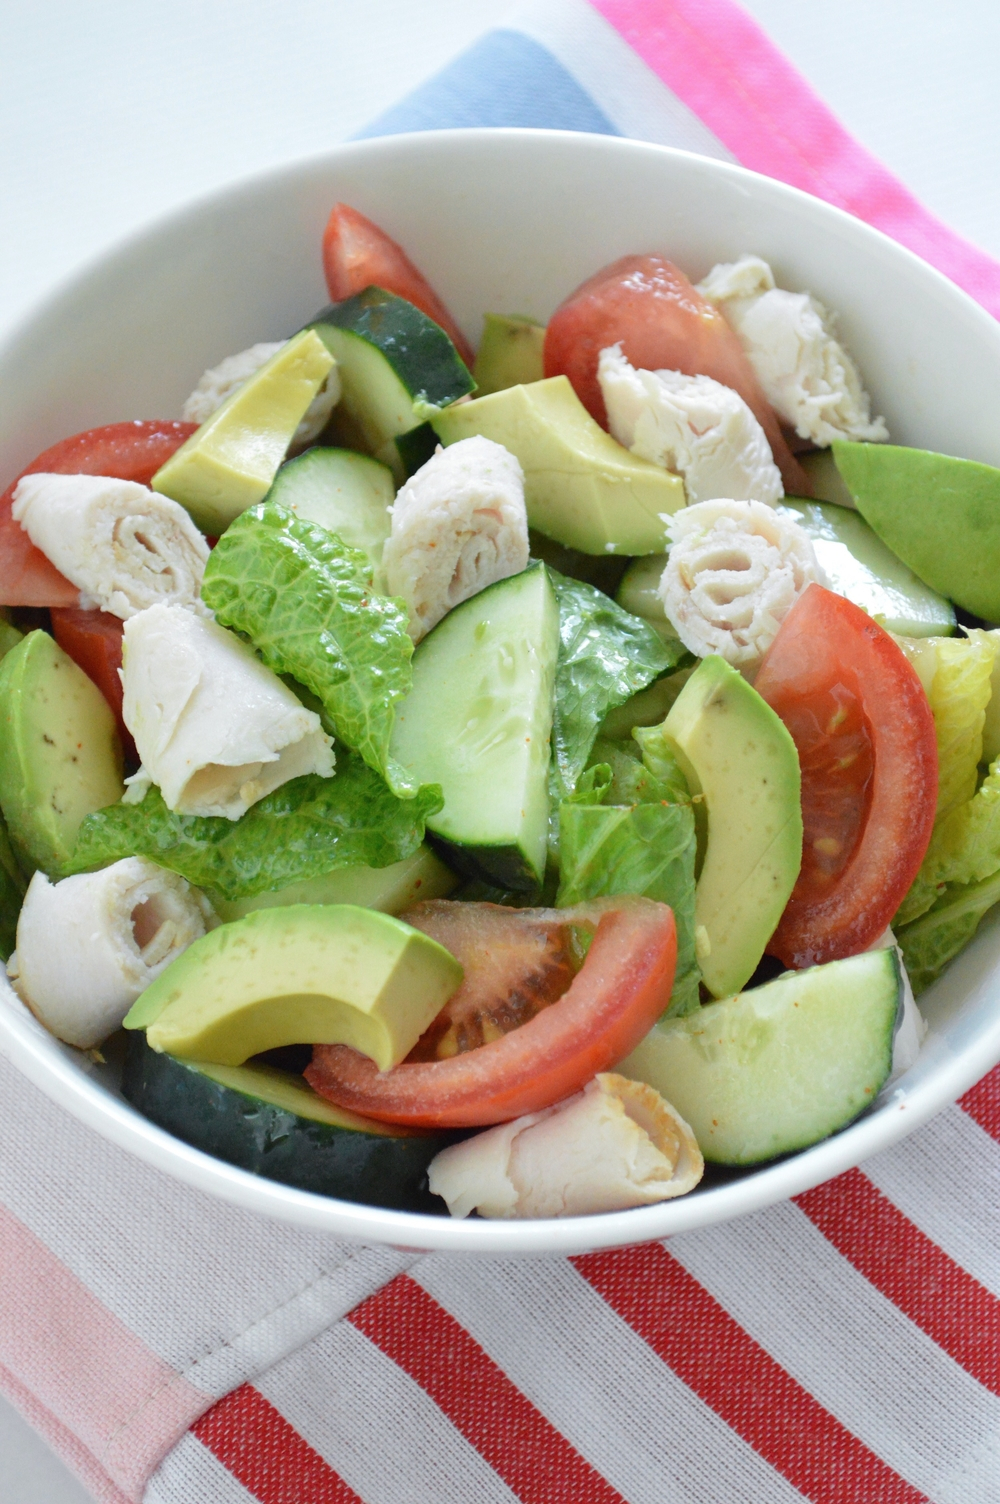 LaurenSchwaiger-Blog-Summer-Salad-Inspiration.jpg